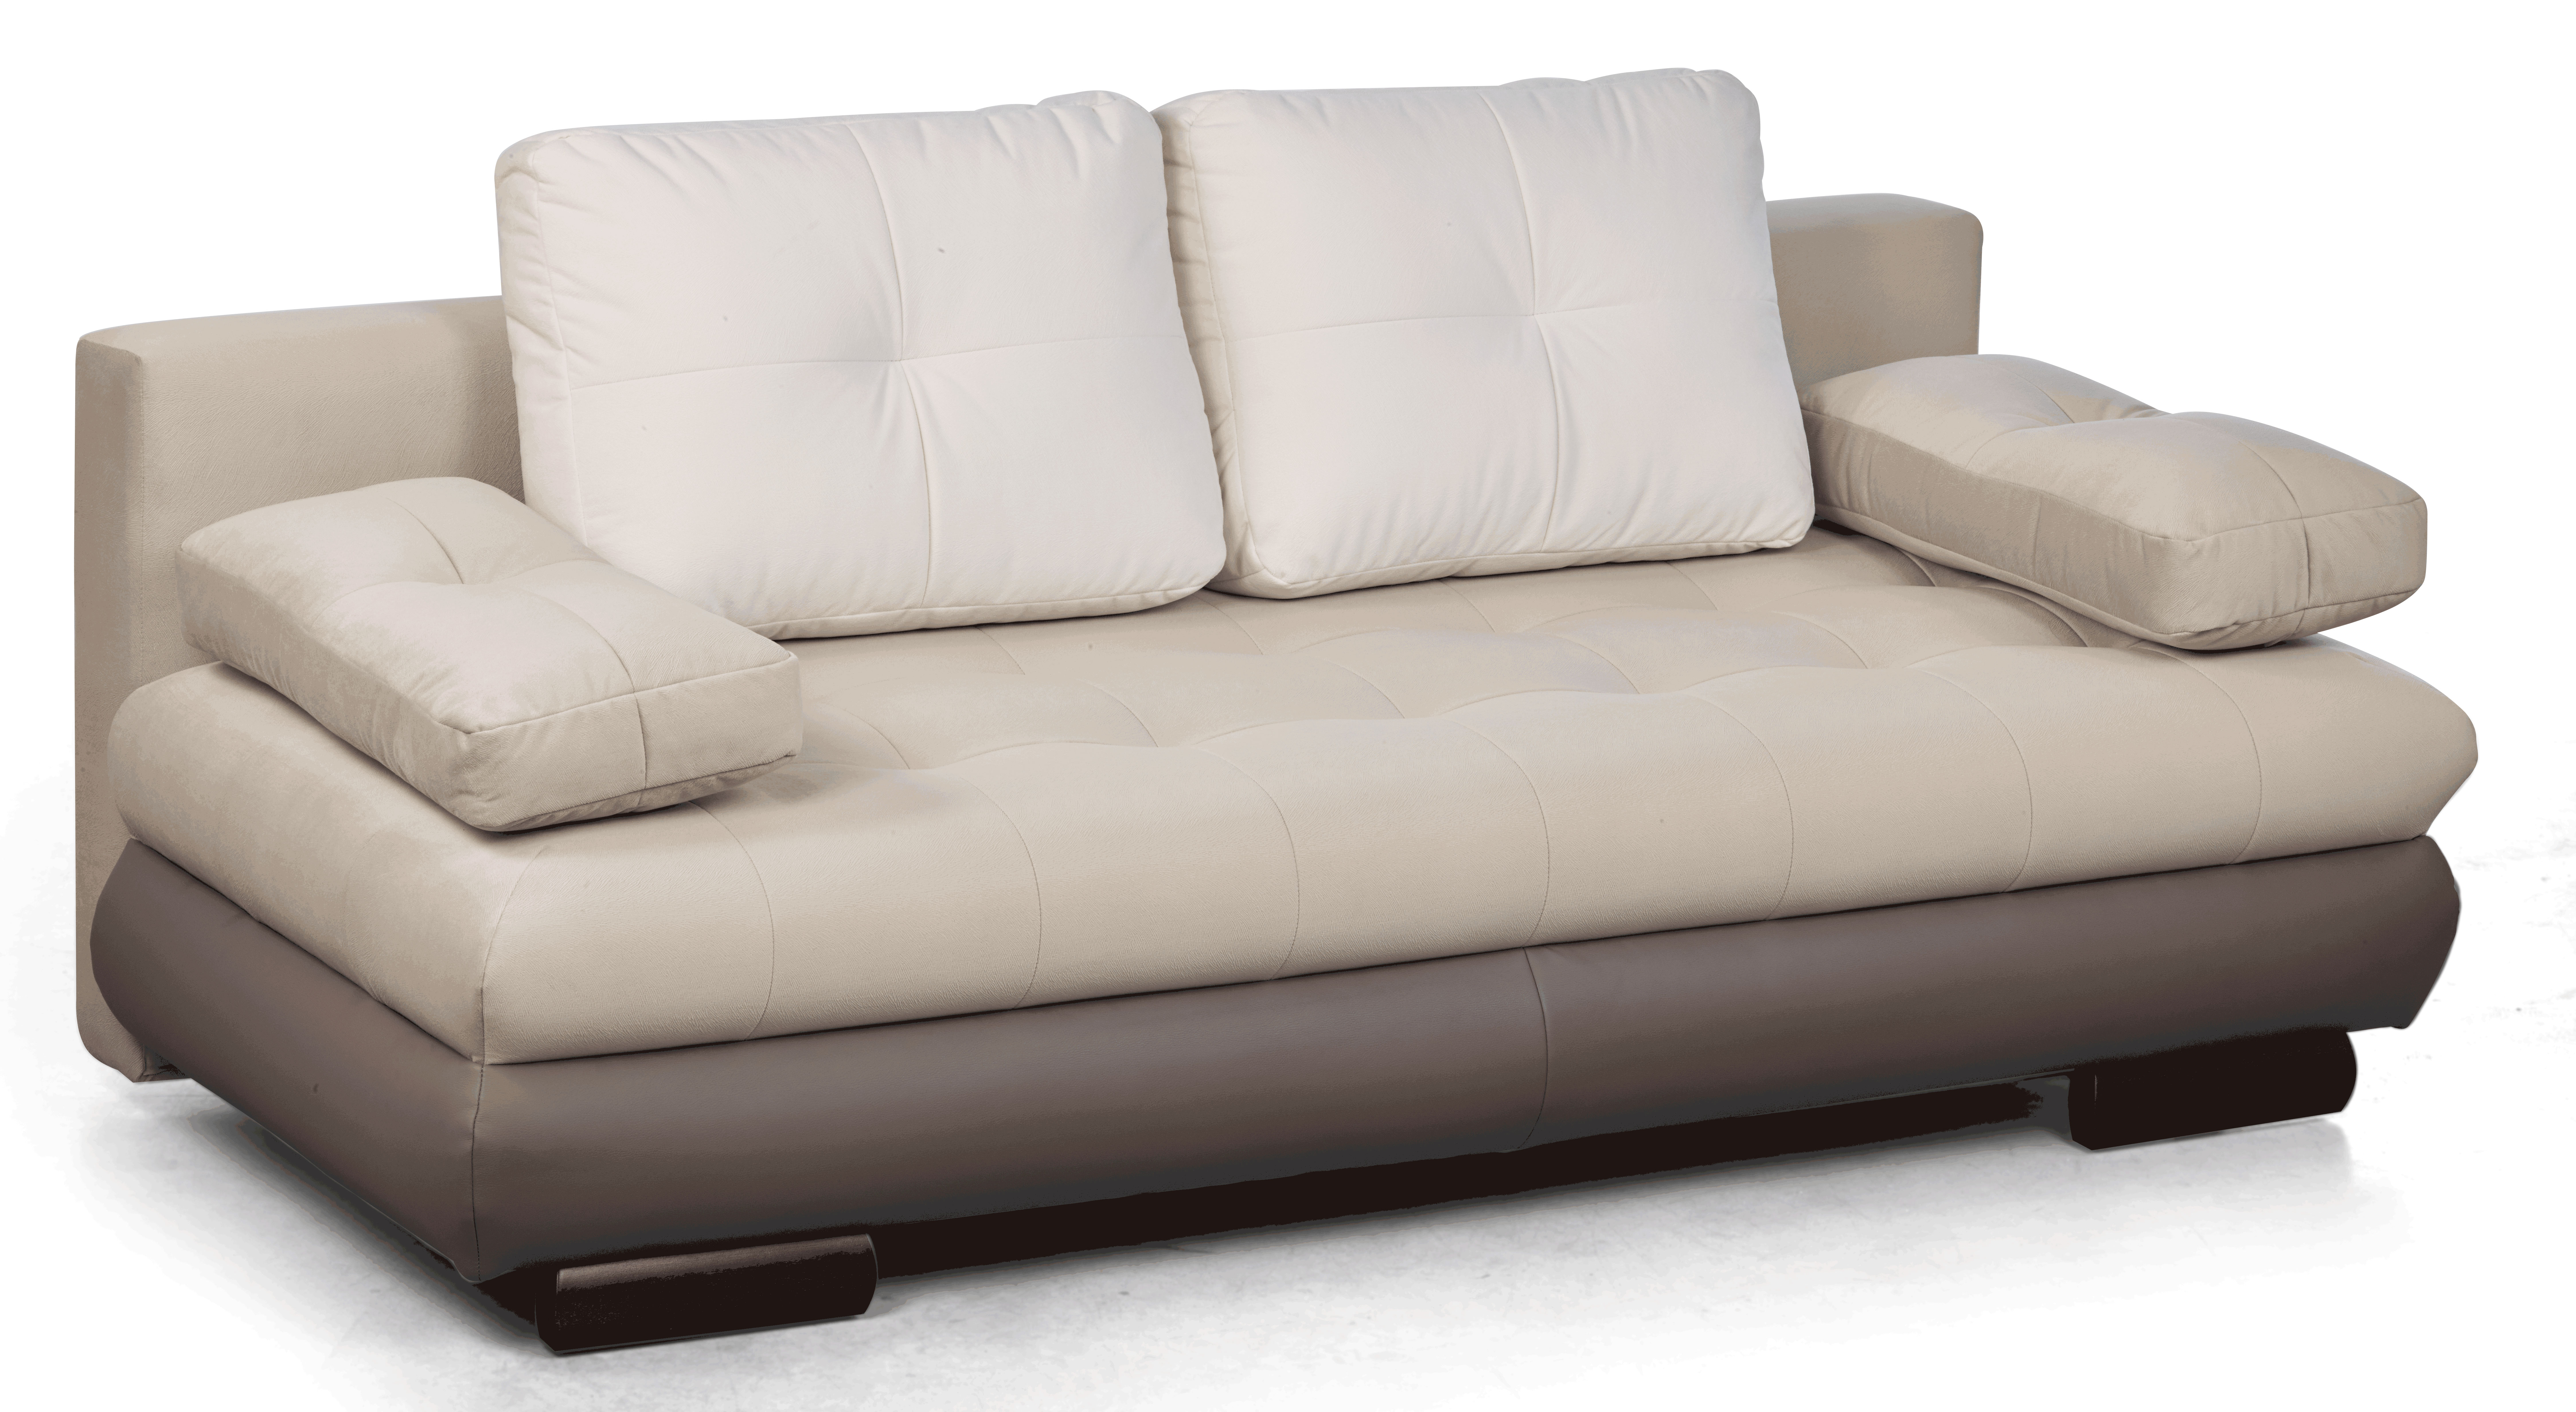 Canapea extensibila 3 locuri Luore Beige